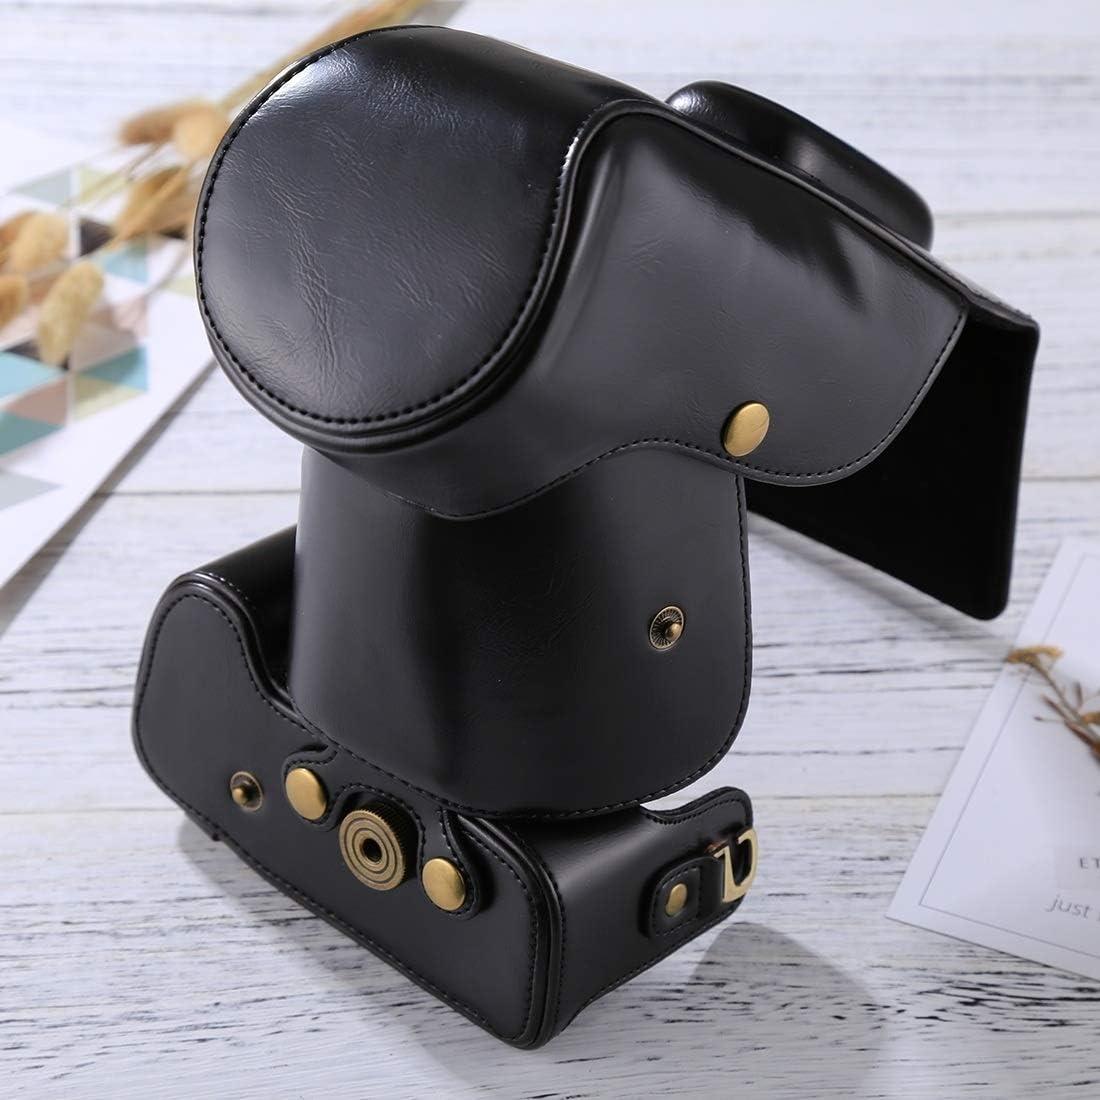 18-55mm // 18-105mm // 18-140mm Lens Color : Brown Black Xdashou Camera Bag Wuzpx Good Body Camera PU Leather Case Bag for Nikon D5300 // D5200 // D5100